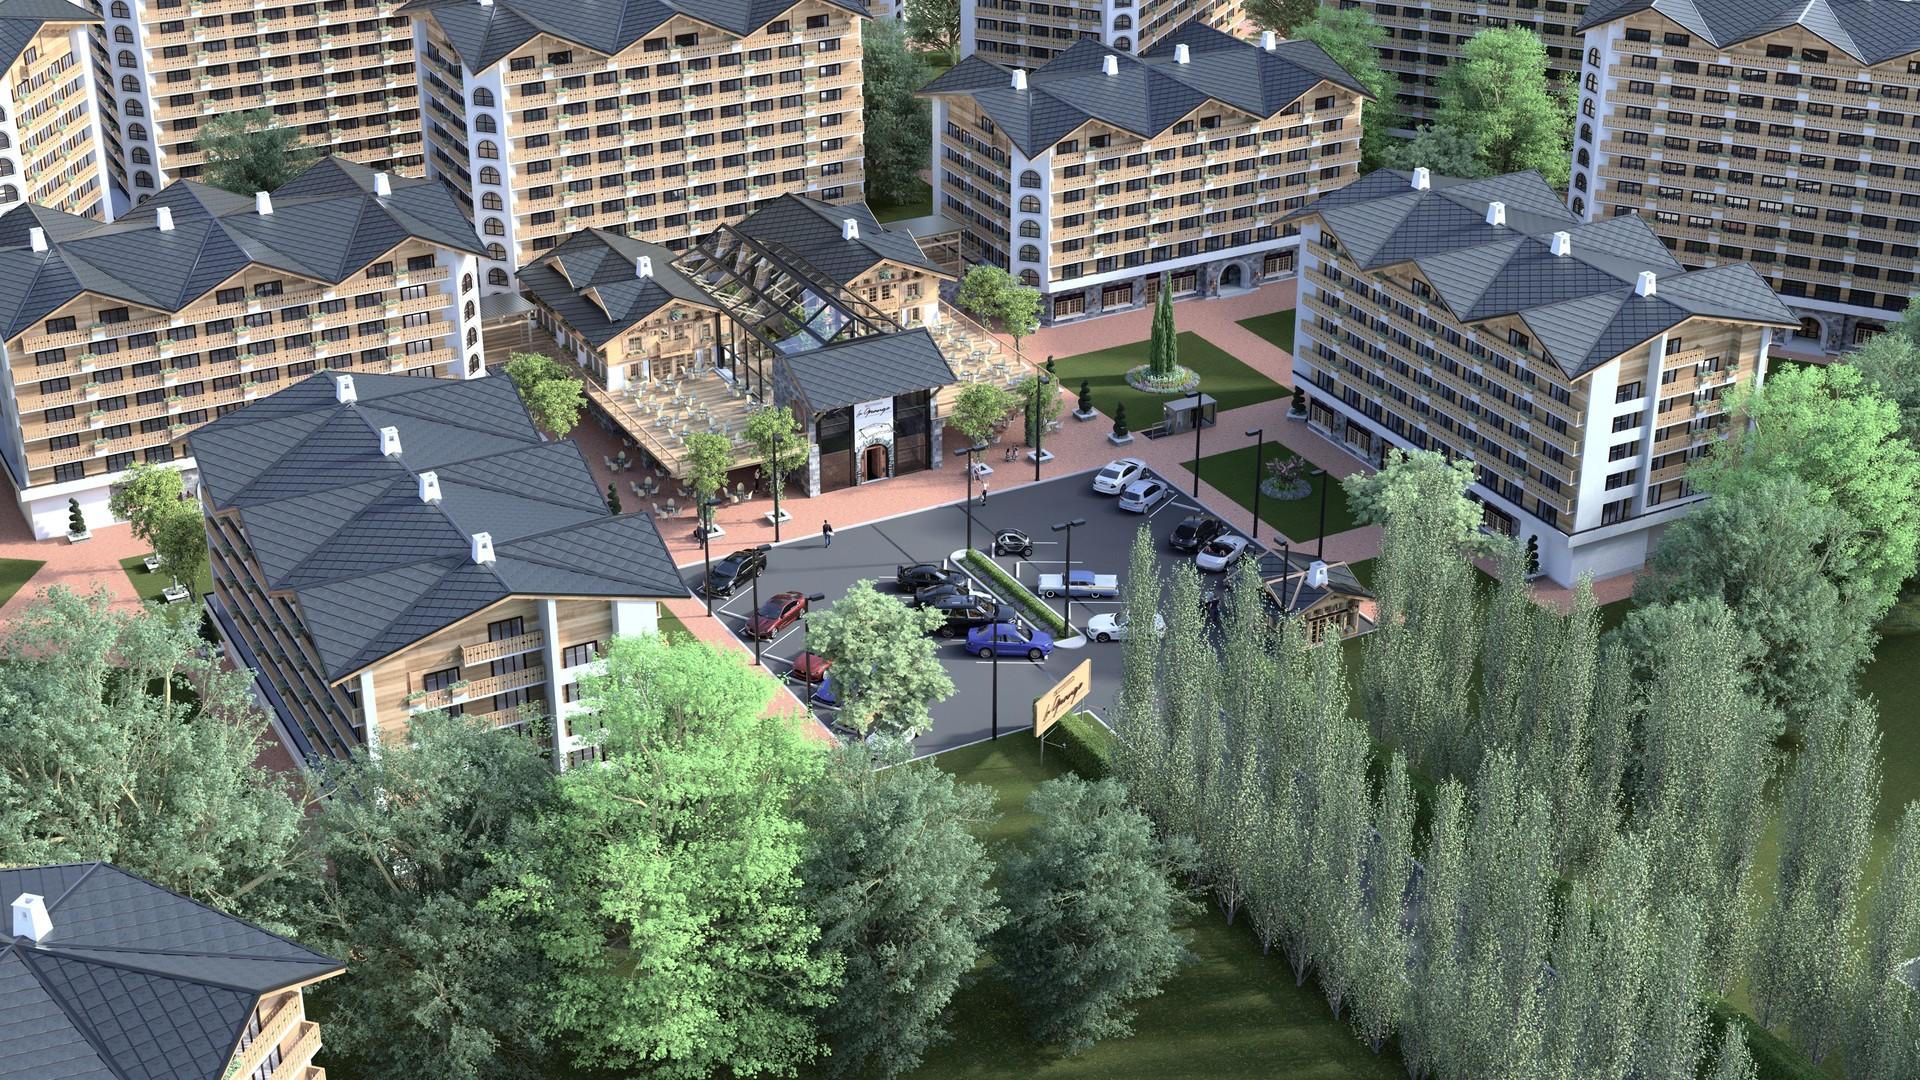 Duane kemp 05 eco cycle alpine hotel v2018 scene 89 pmc 1024 s px 2840x2160 3h54 dosche 2 25 fp2900zg crf b